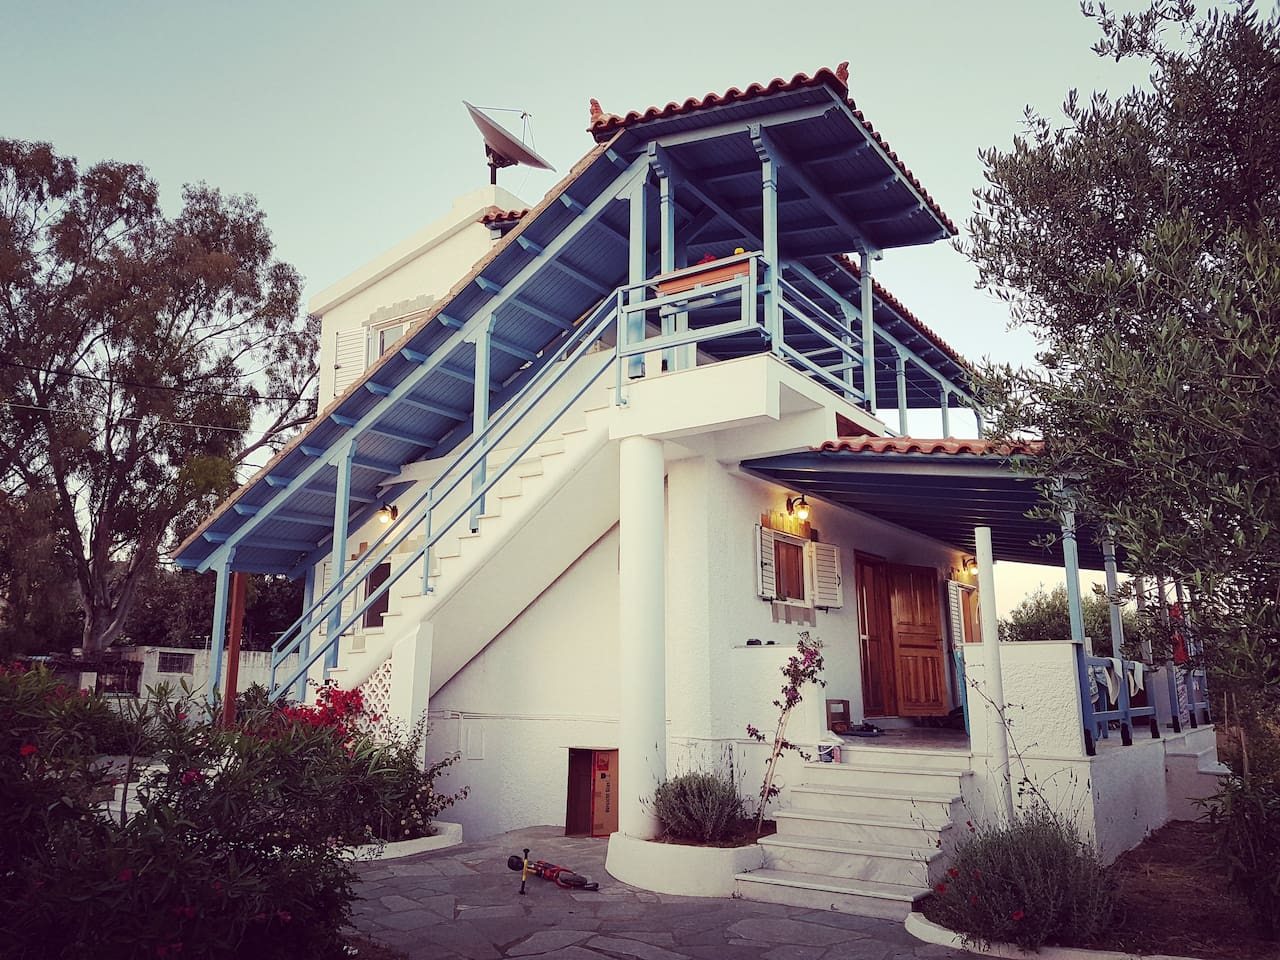 2 floors, 3 bedrooms, 2 bathrooms, 2 large balconies in the heart of a producing olive garden.